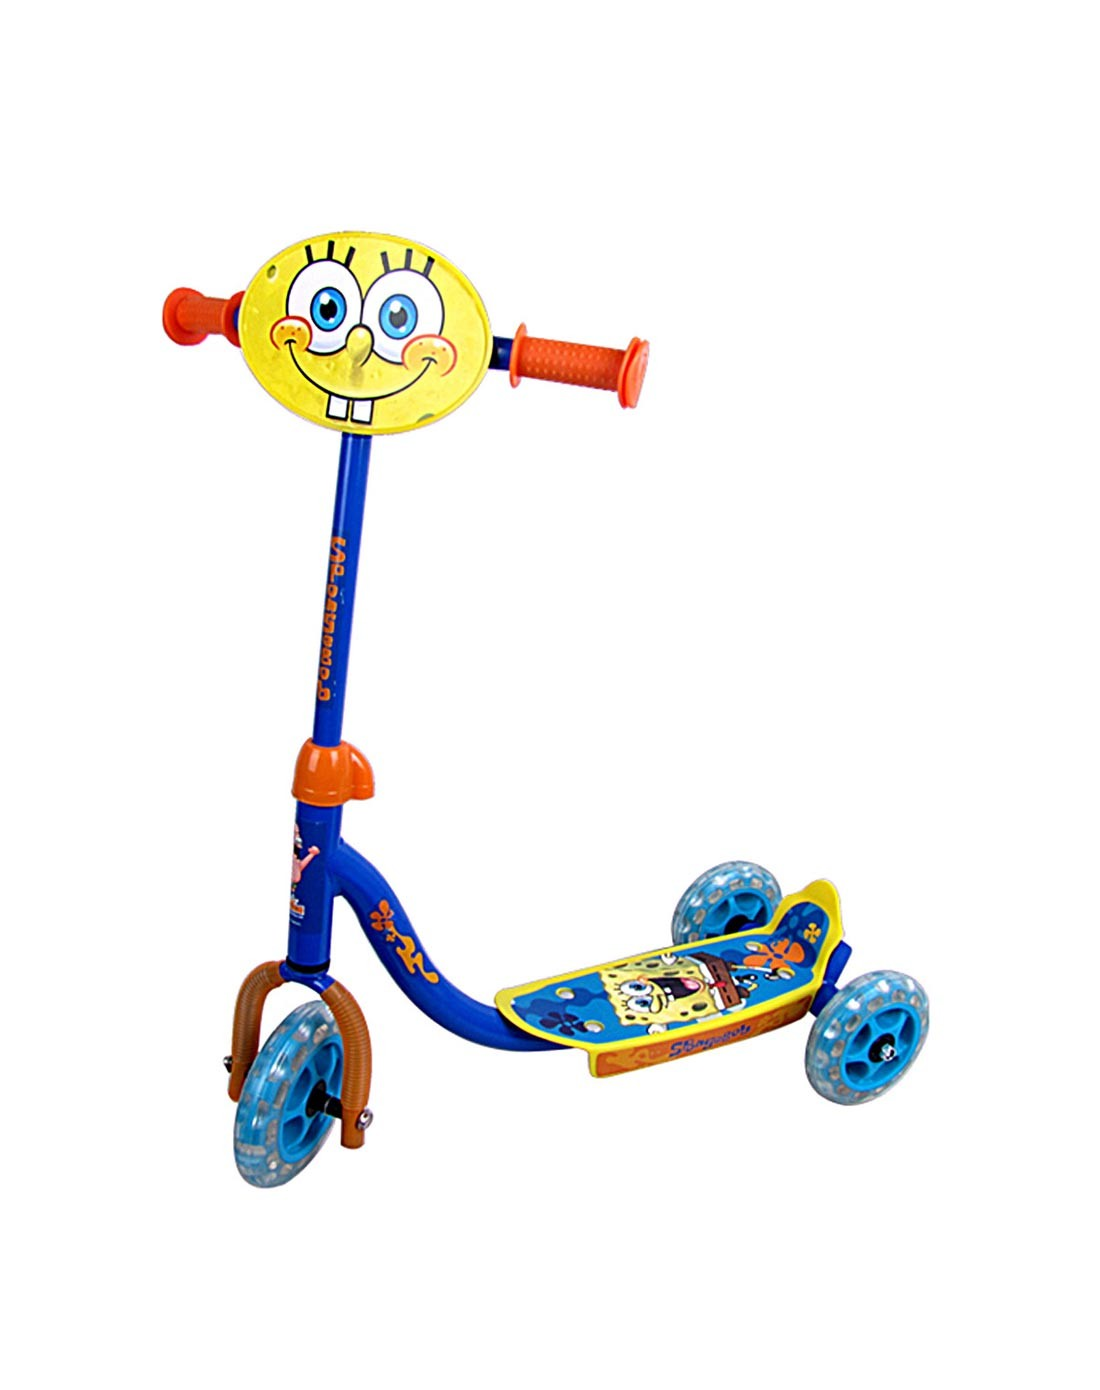 squarepants三轮儿童滑板车sp832